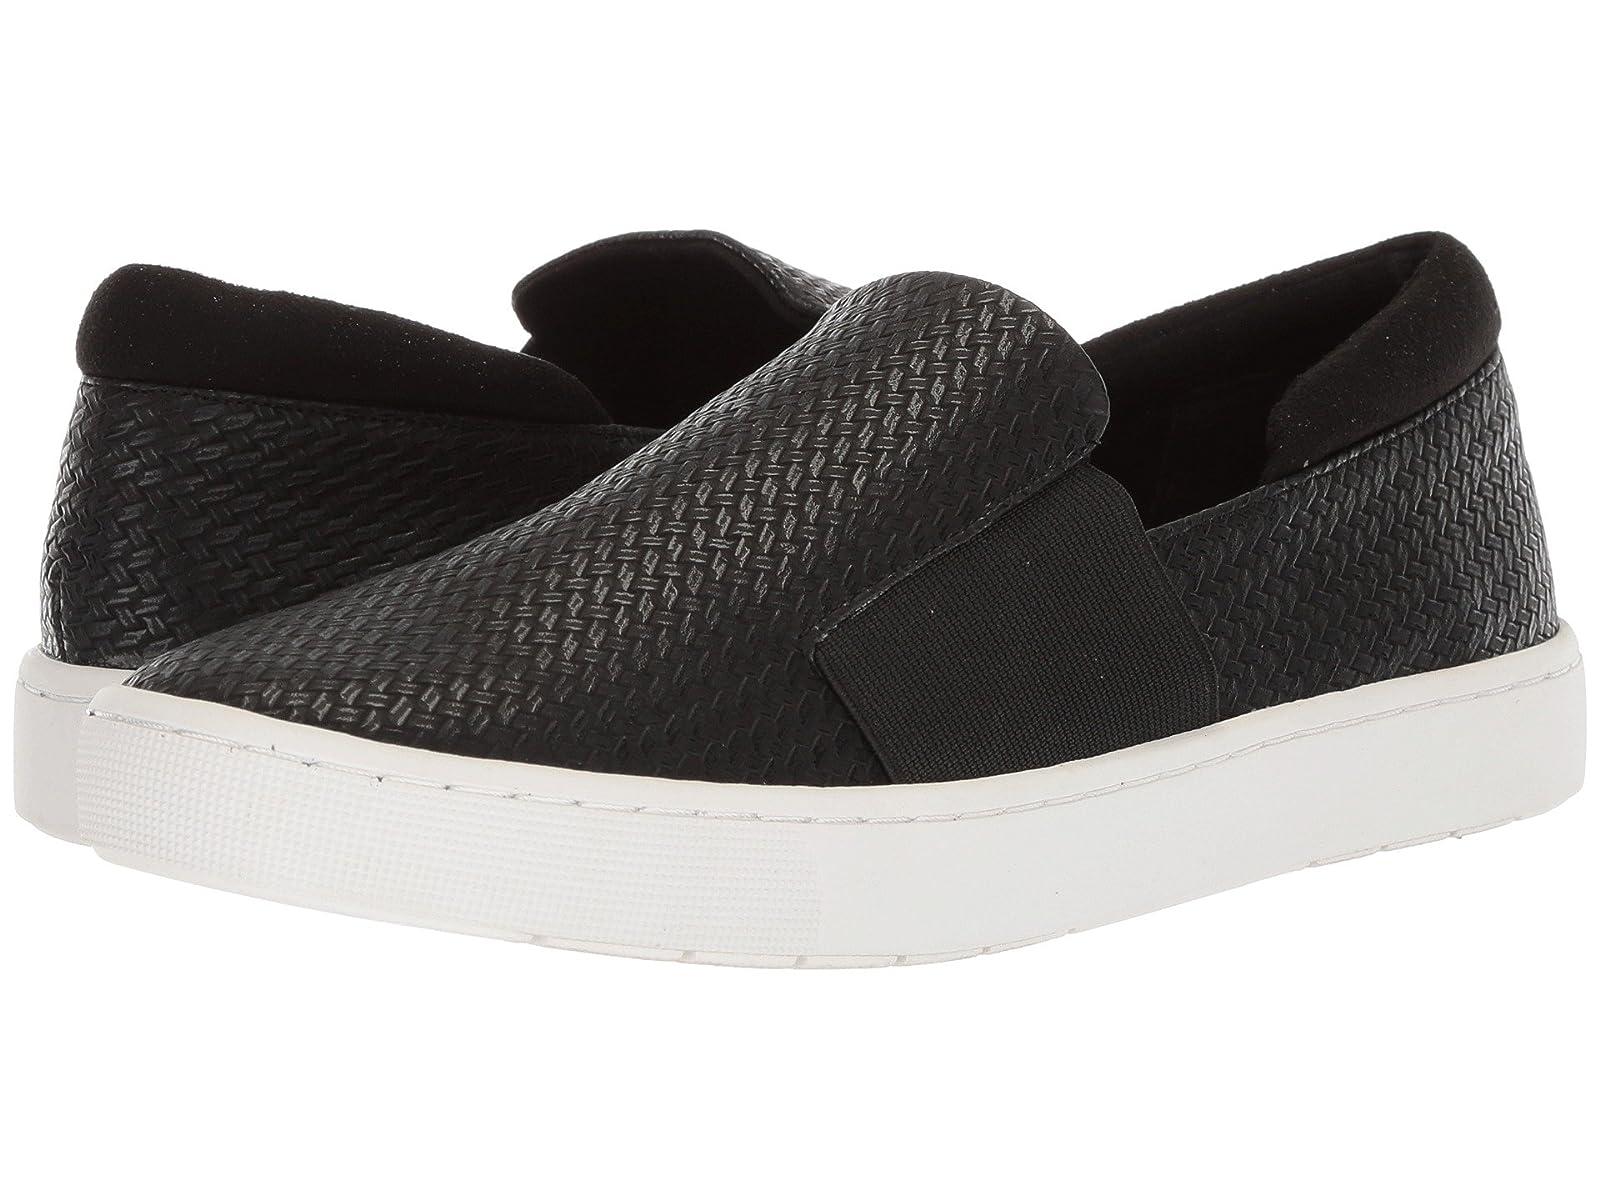 Bella-Vita Ramp IIAtmospheric grades have affordable shoes